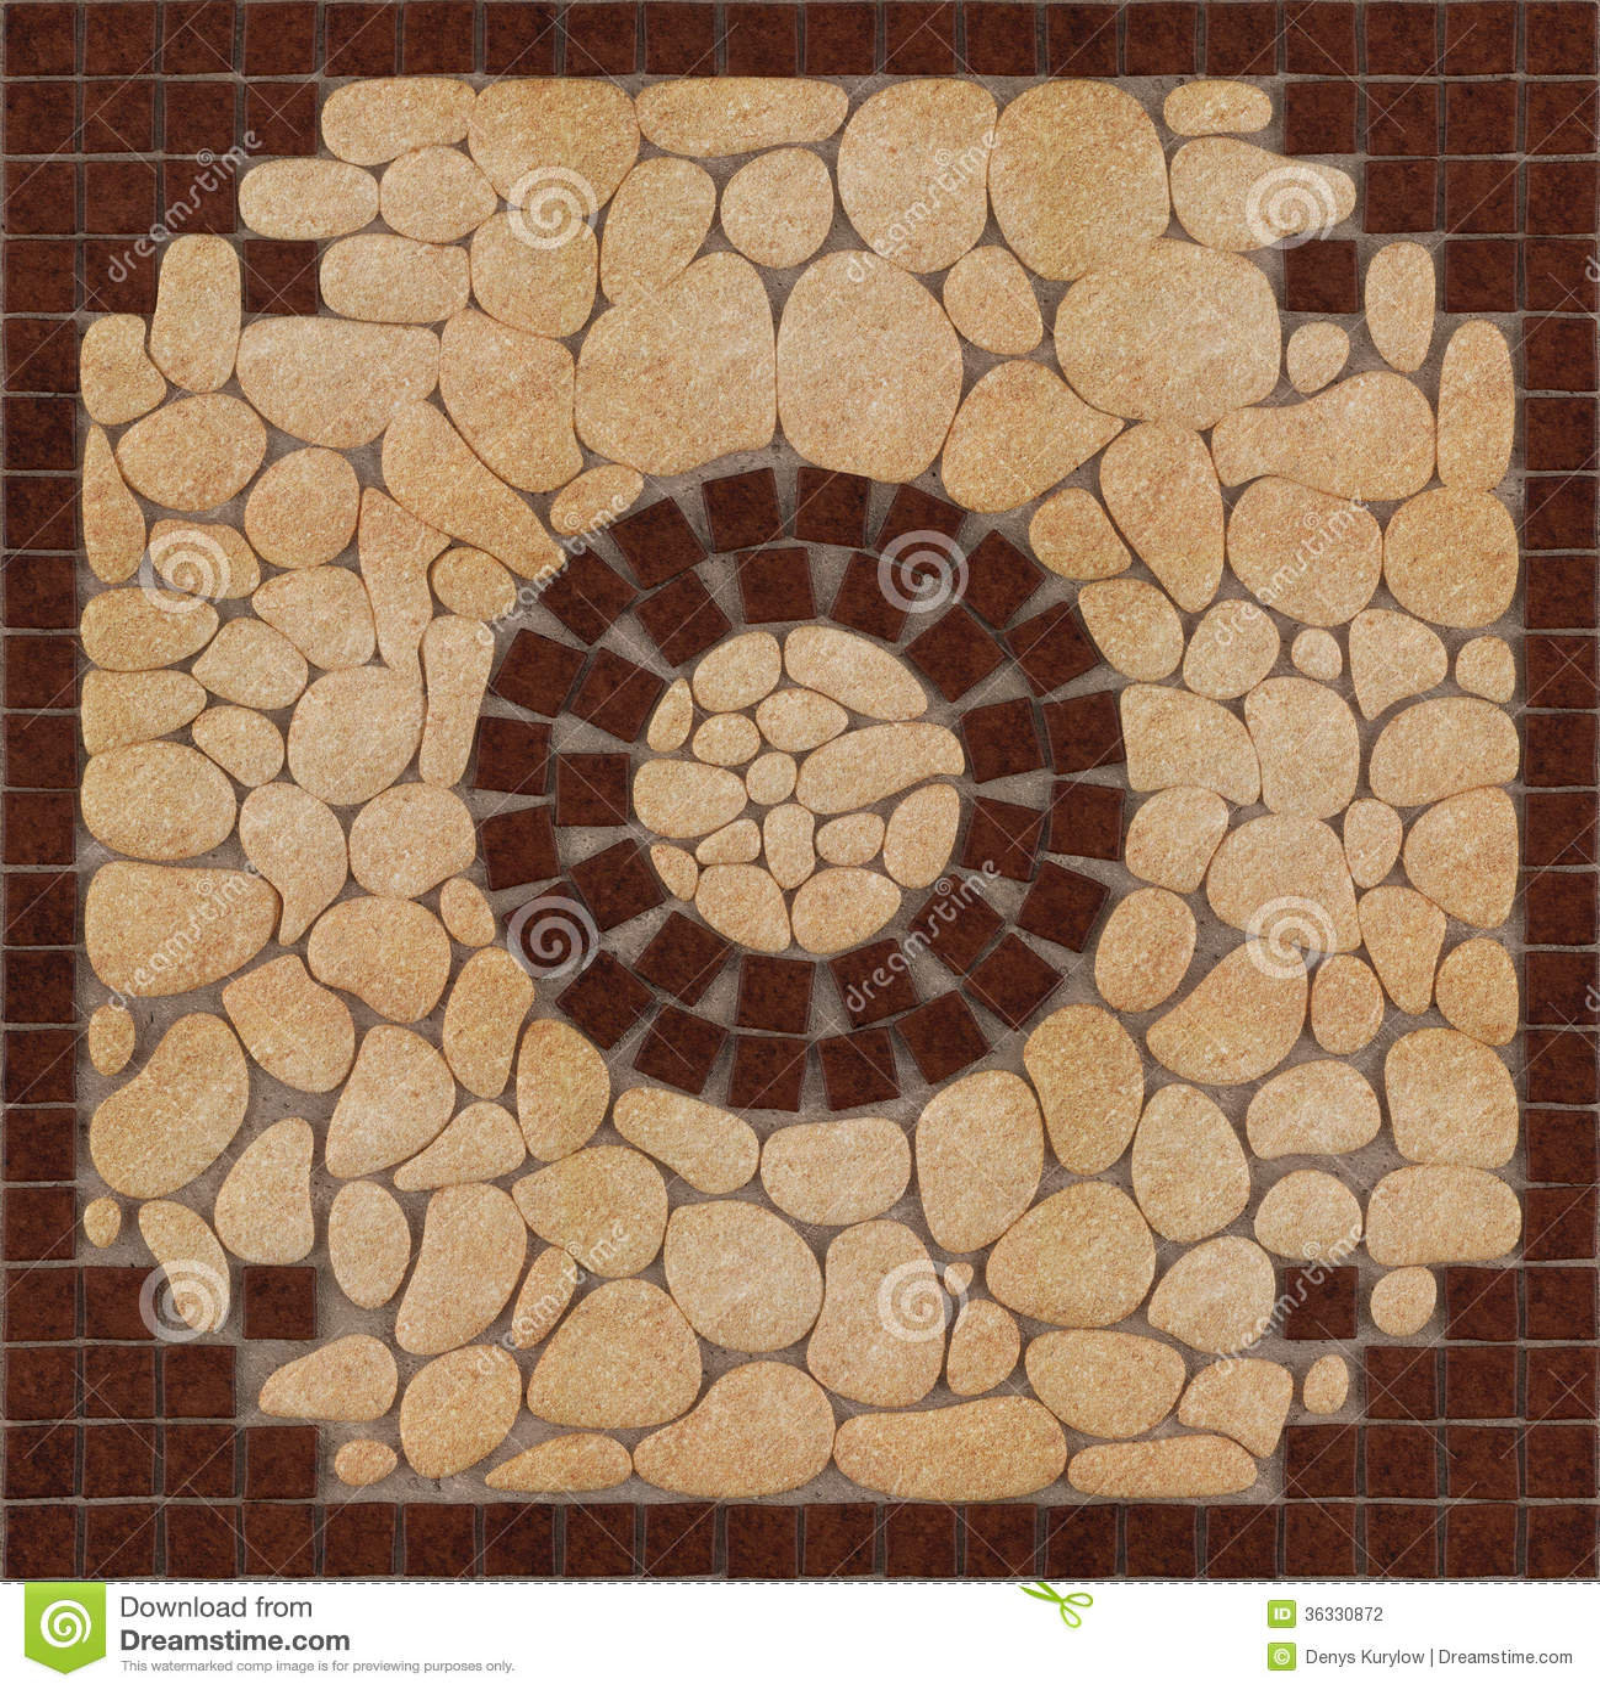 Stone Floor Patterns : Stone floor pattern tiles stock photography image